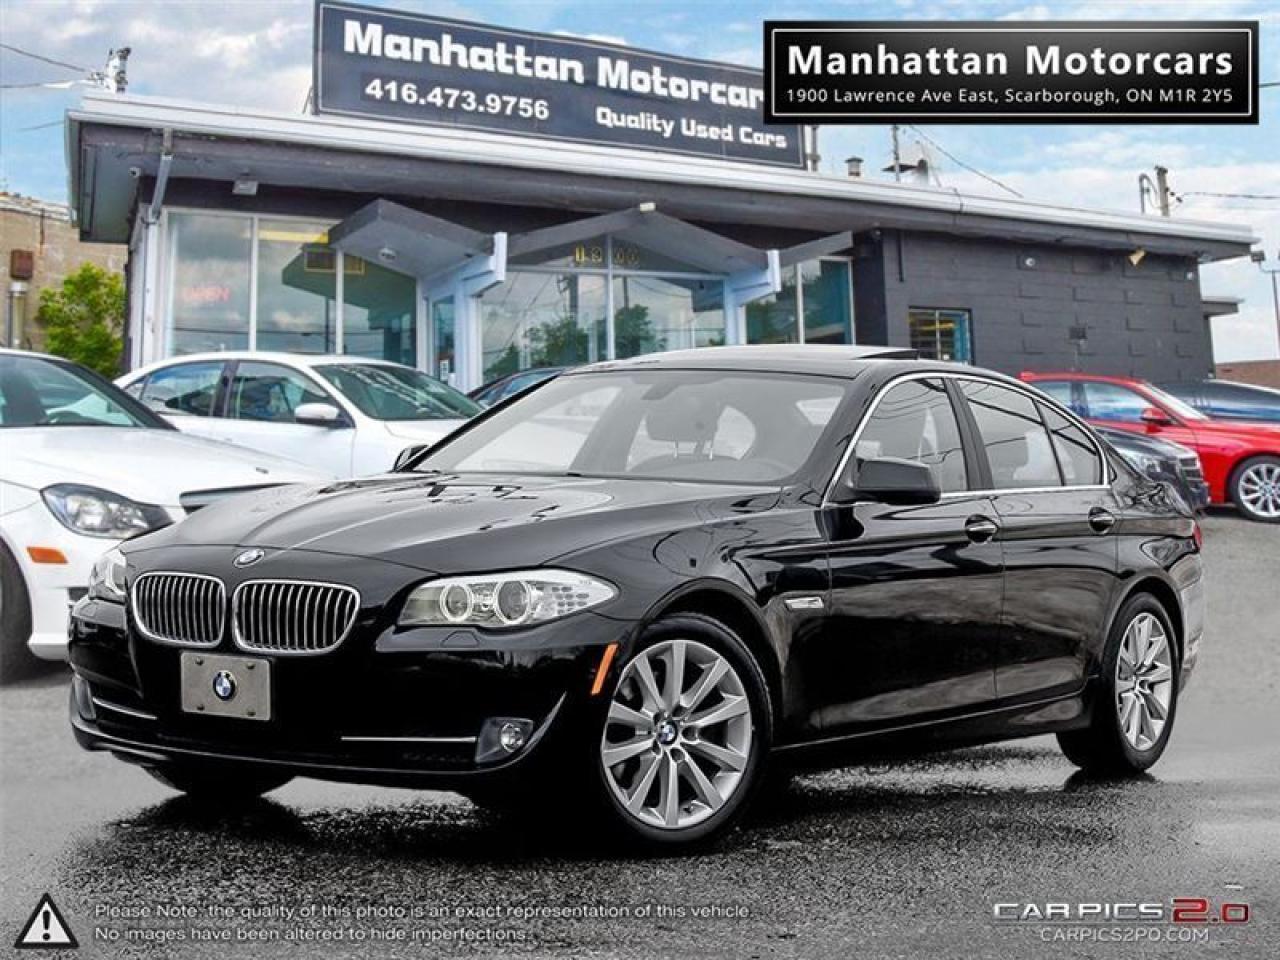 2013 BMW 5 Series 528i X-DRIVE PREMIUM |SIDE&B.UP CAMERA|PHONE